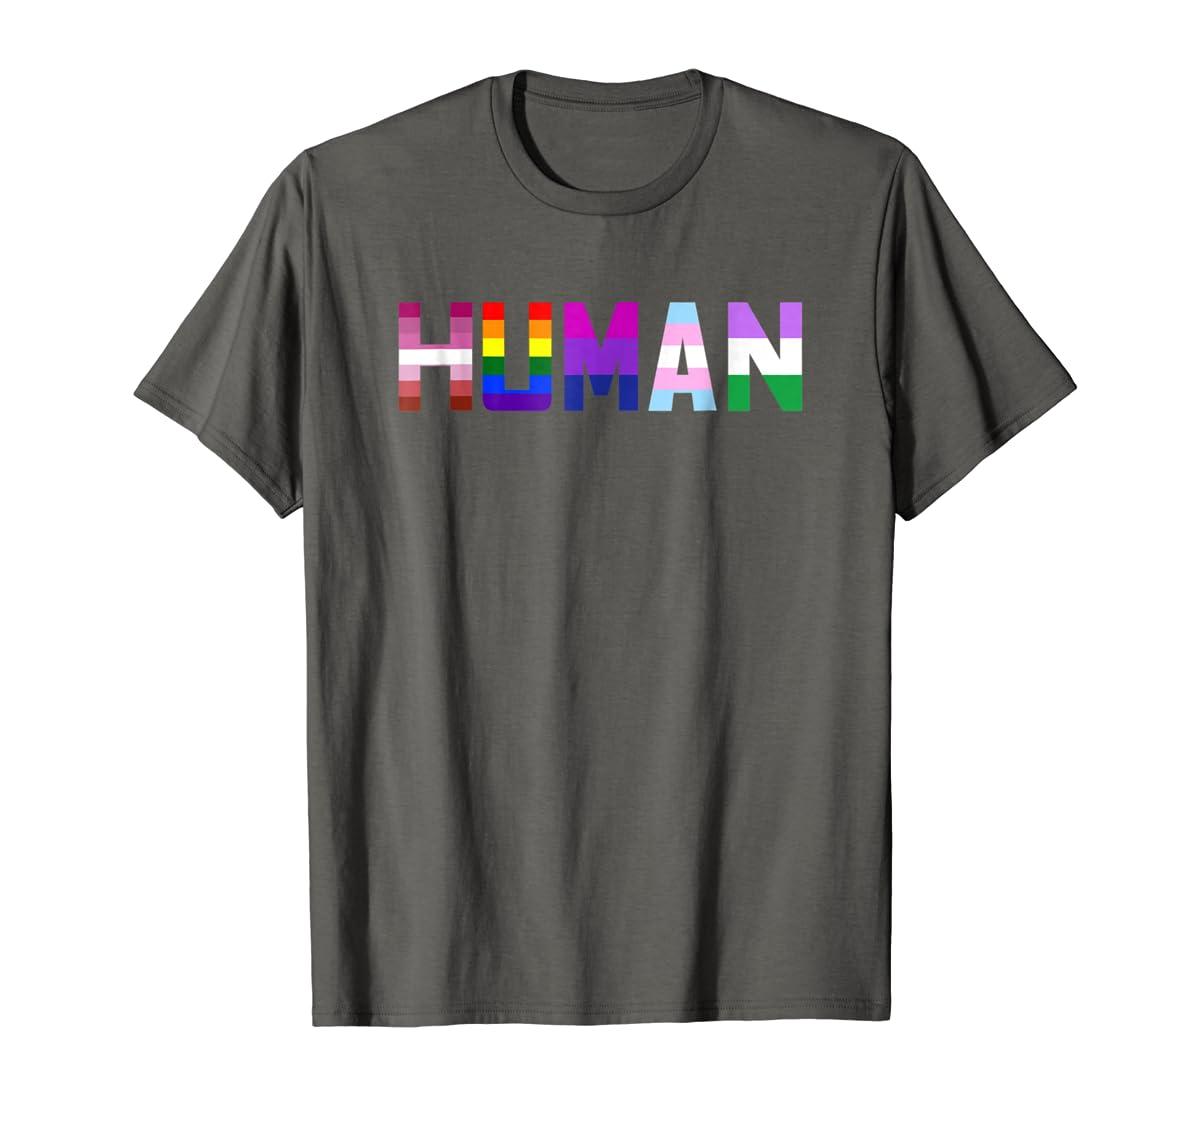 HUMAN Flag LGBT Gay Pride Month Transgender Ally T Shirt-Men's T-Shirt-Dark Heather